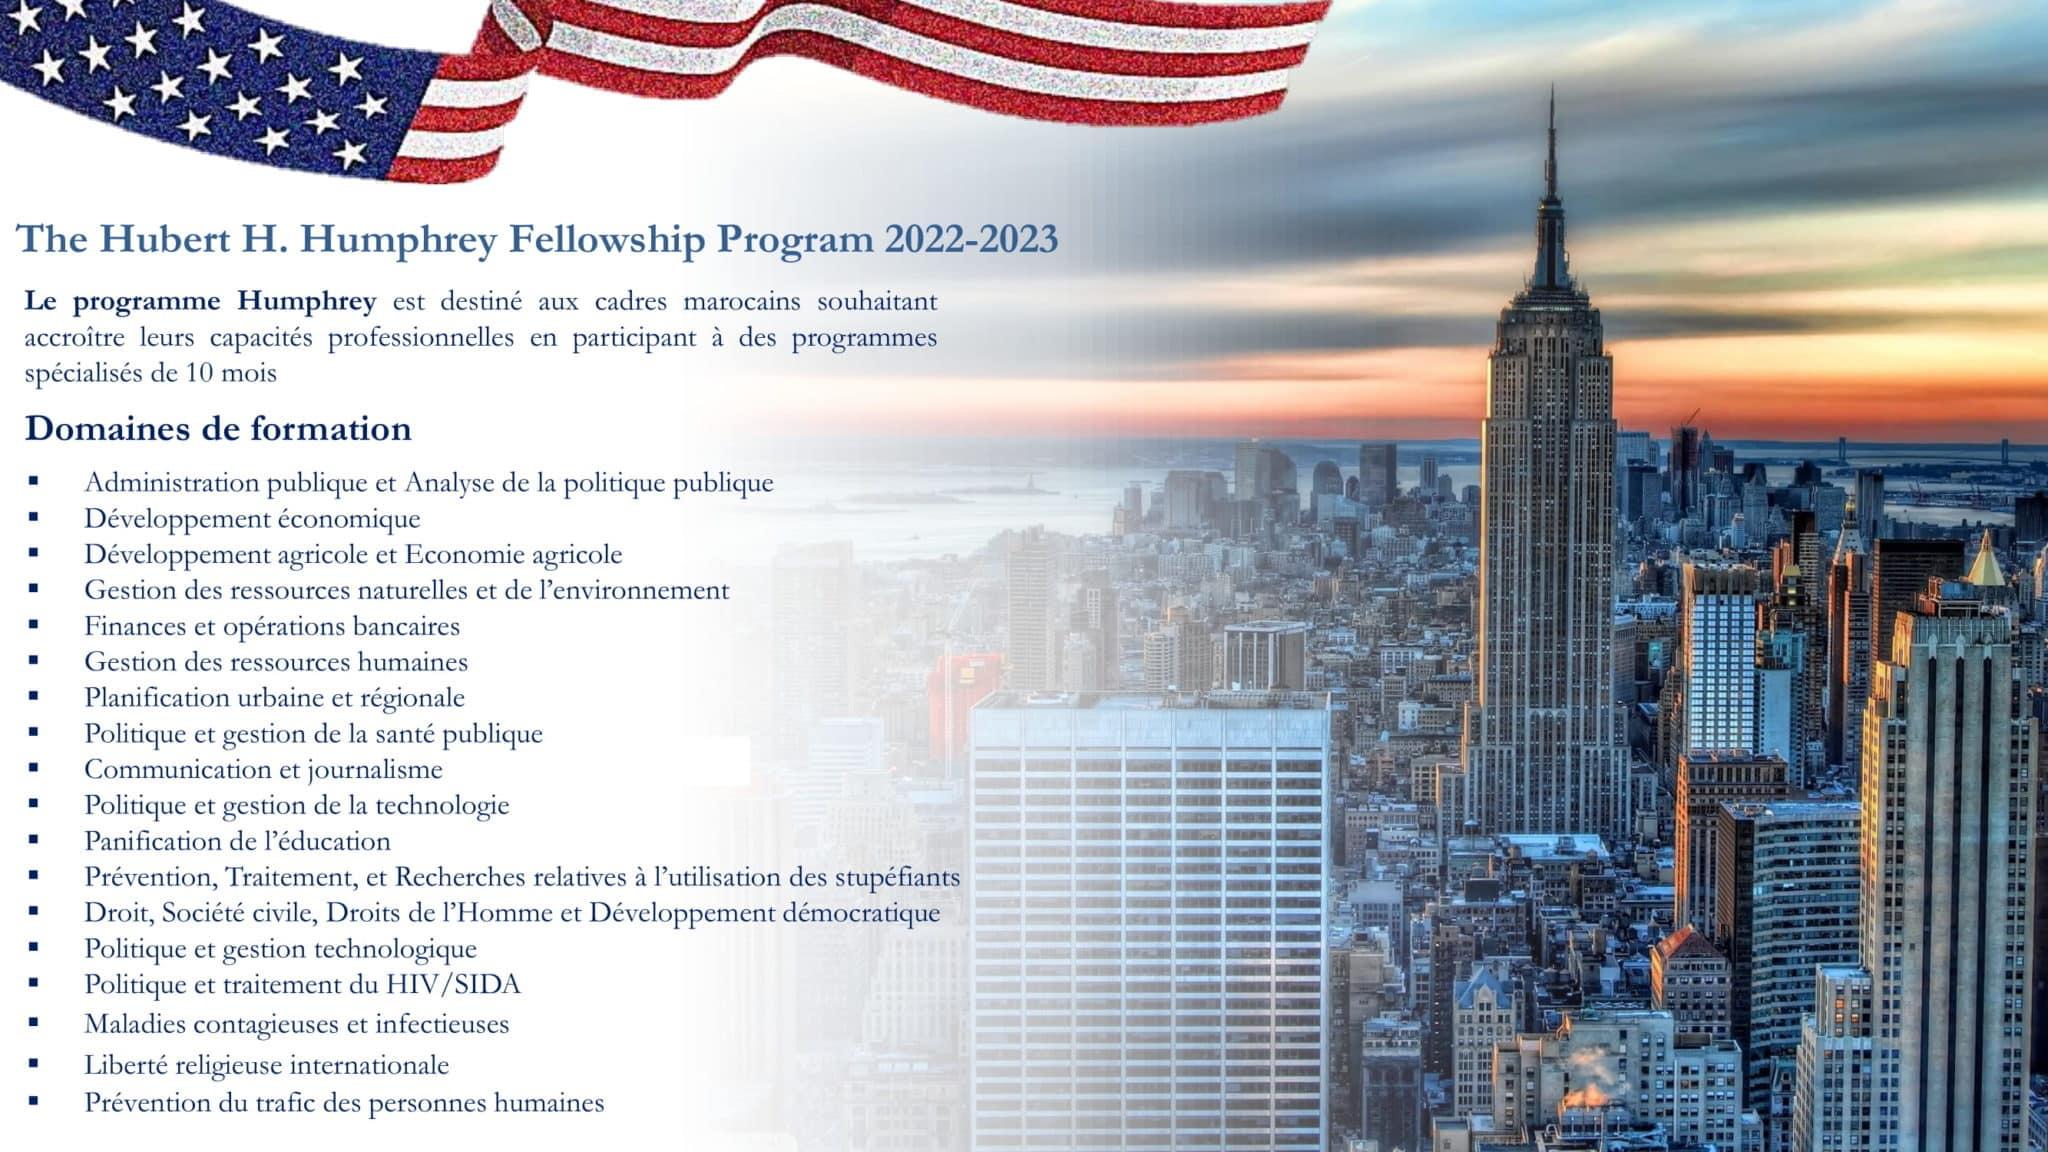 USA2 1 scaled The Hubert H. Humphrey Fellowship Program 2022/2023